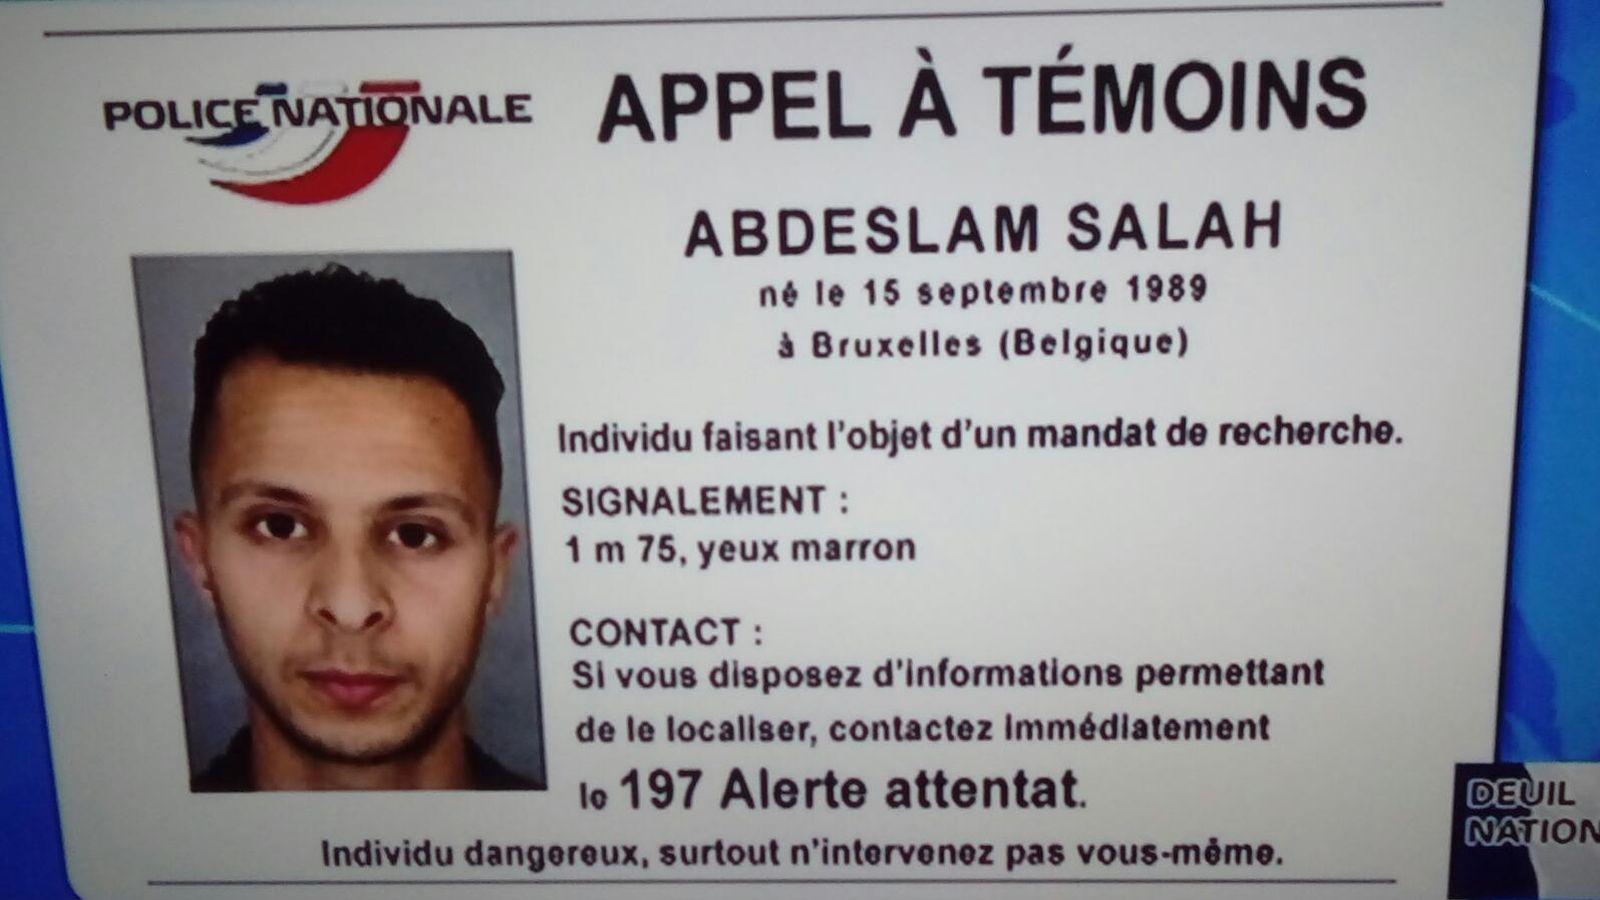 Foto: Mensaje de la policía francesa sobre Abdeslam Salah